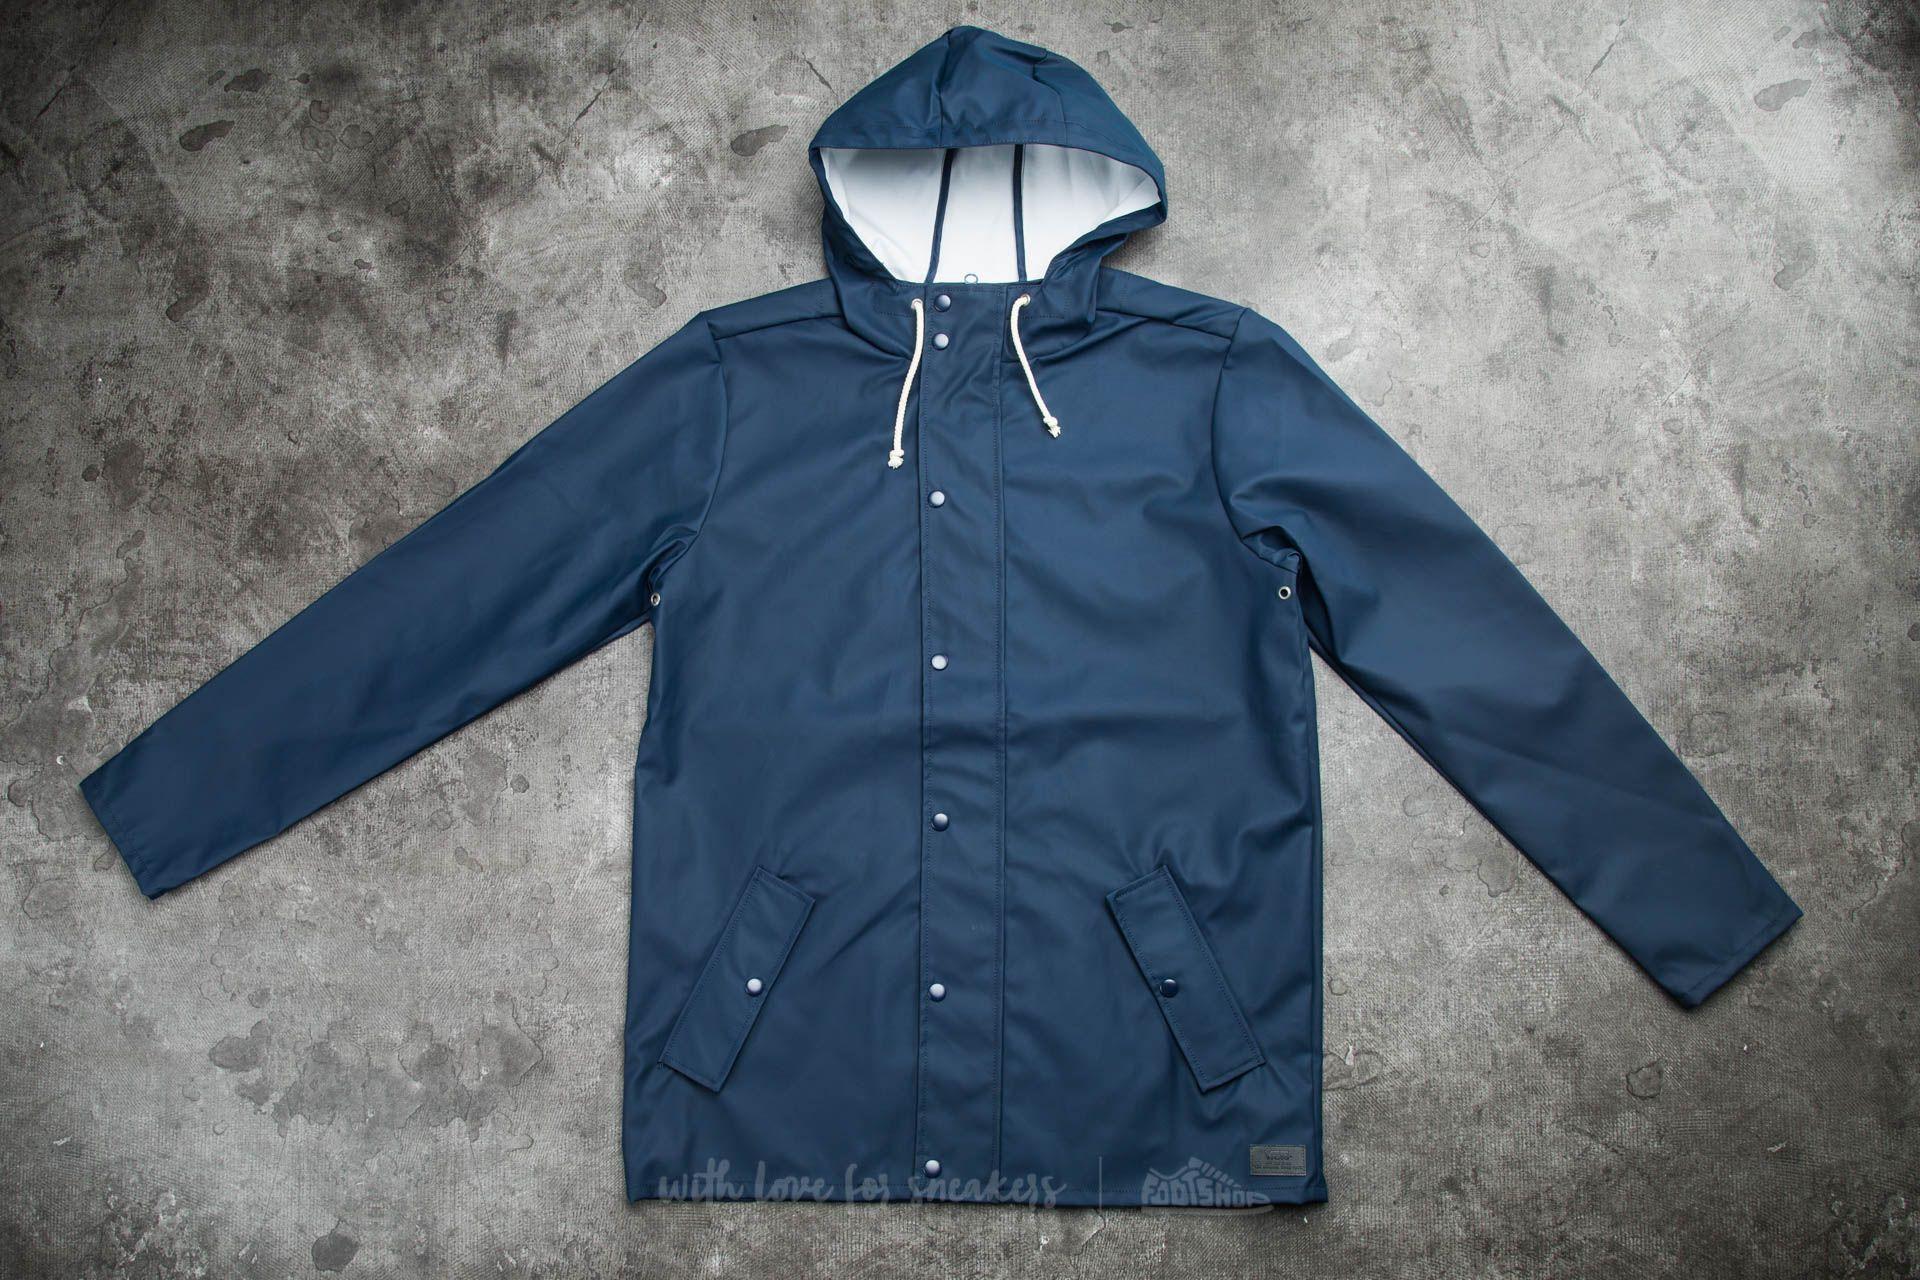 5884b9725f Vans Junipero Mountain Edition Jacket Dress Blues